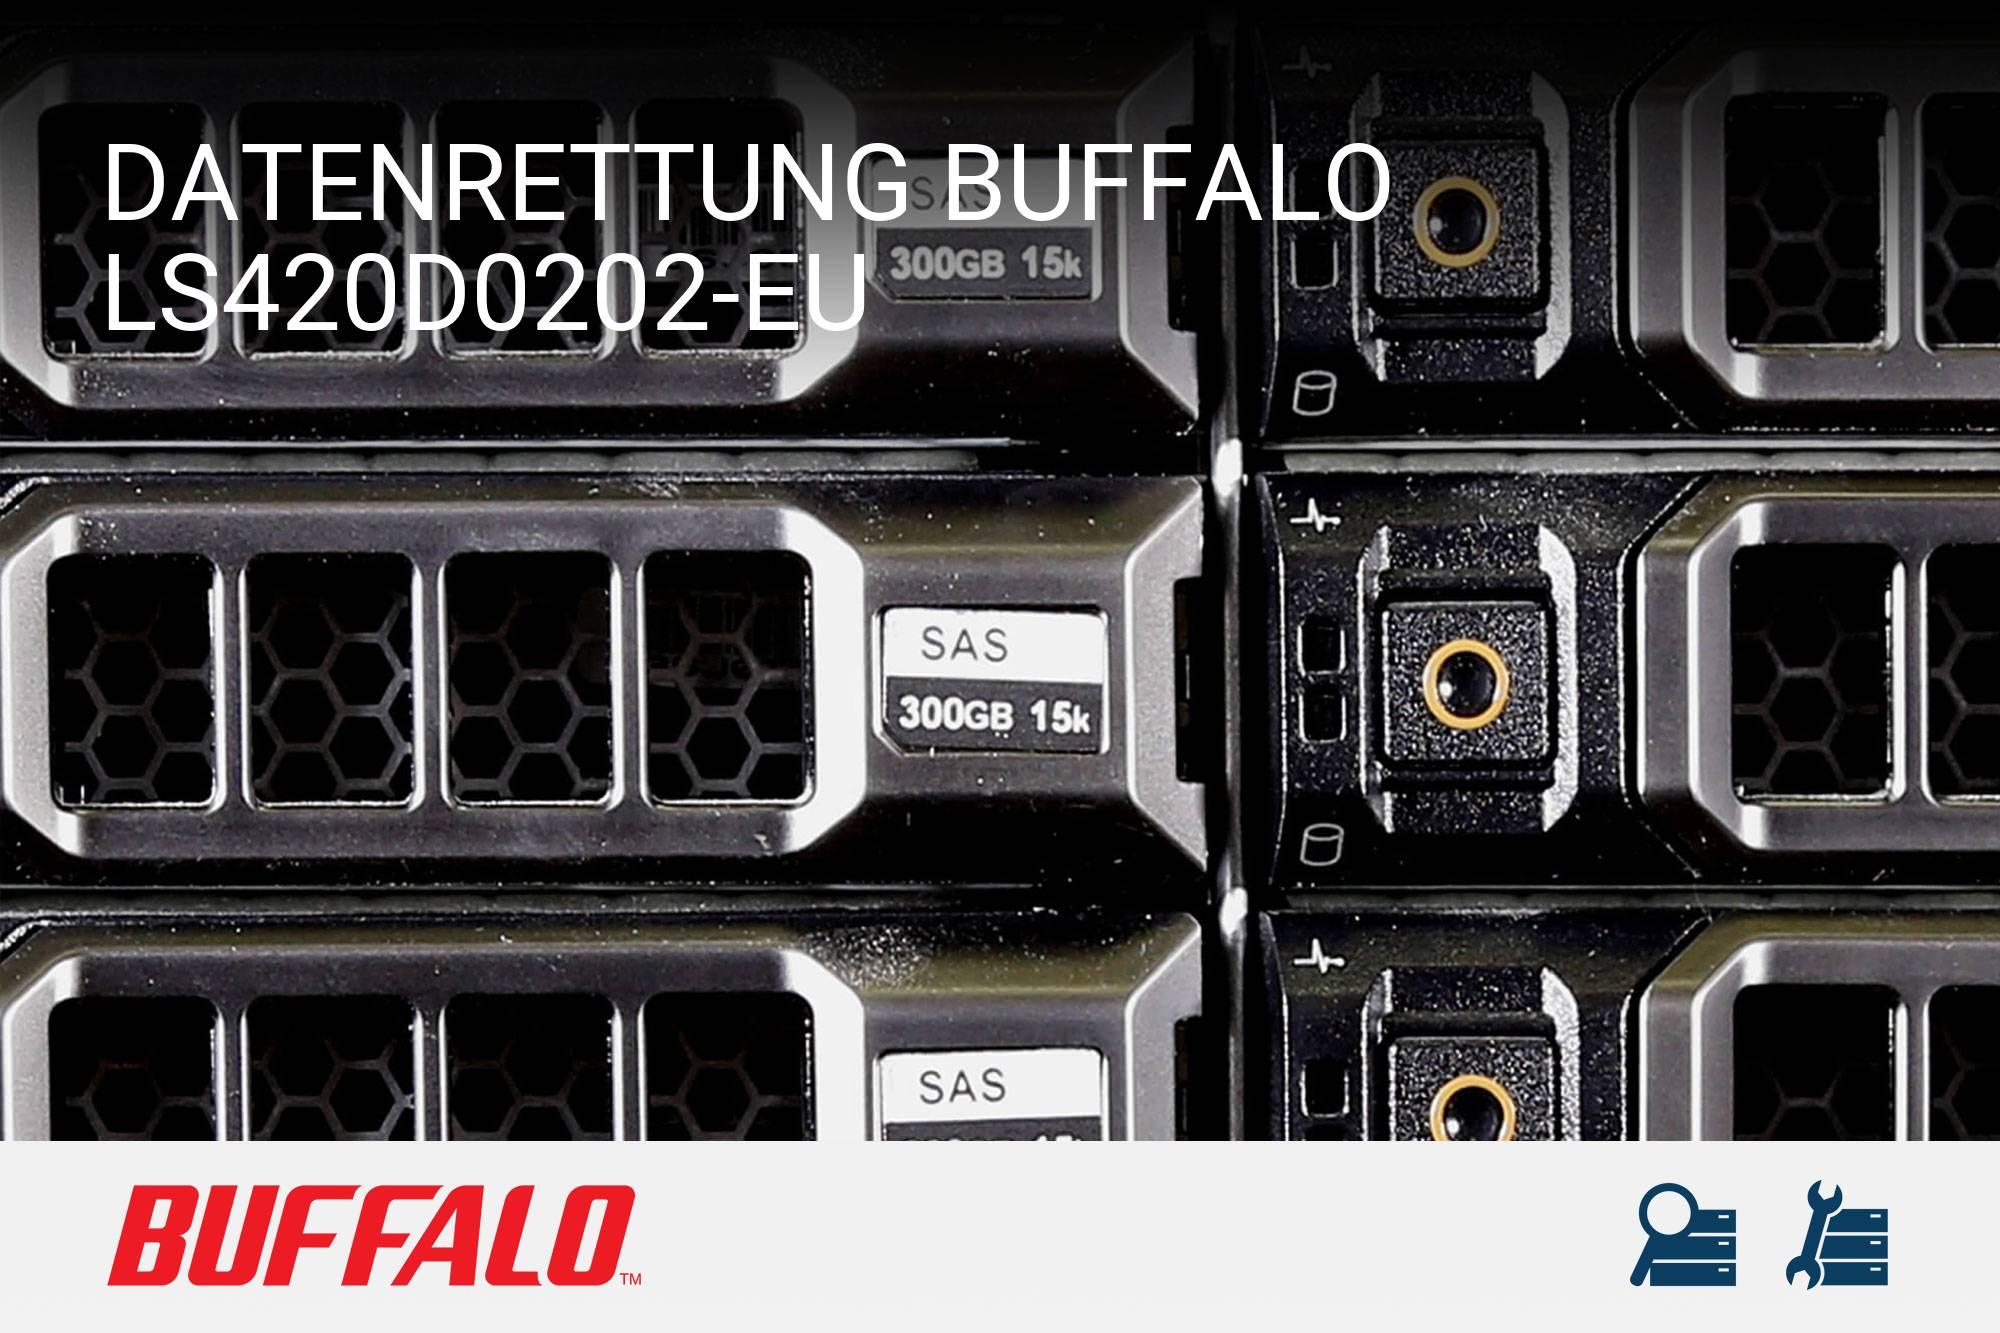 Buffalo LS420D0202-EU